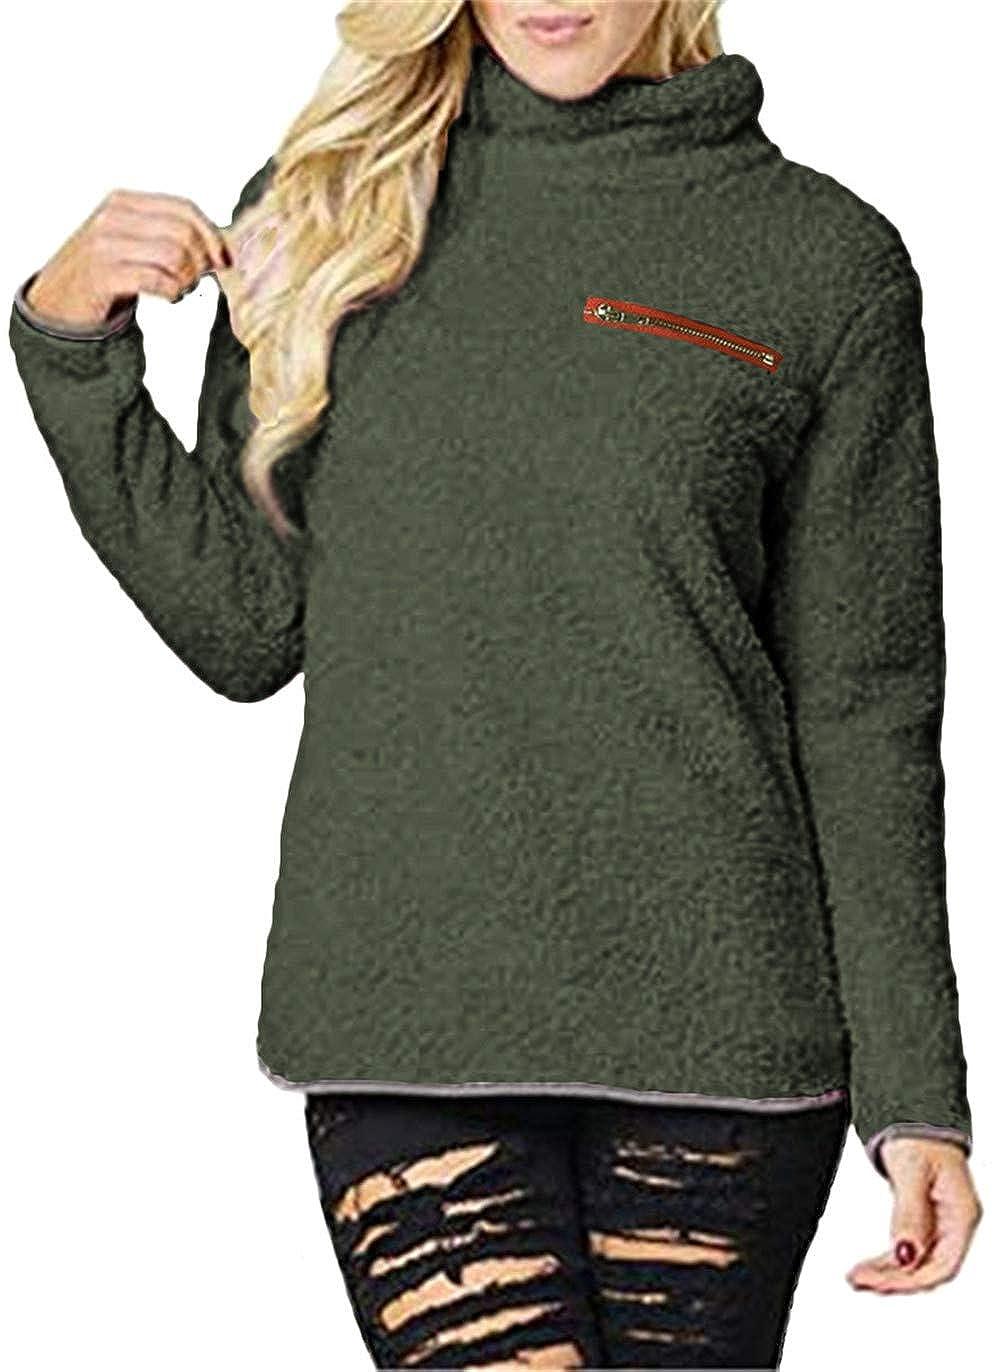 tee Doryti This Job Things Sure is Messing UP My Camping Career Women Sweatshirt